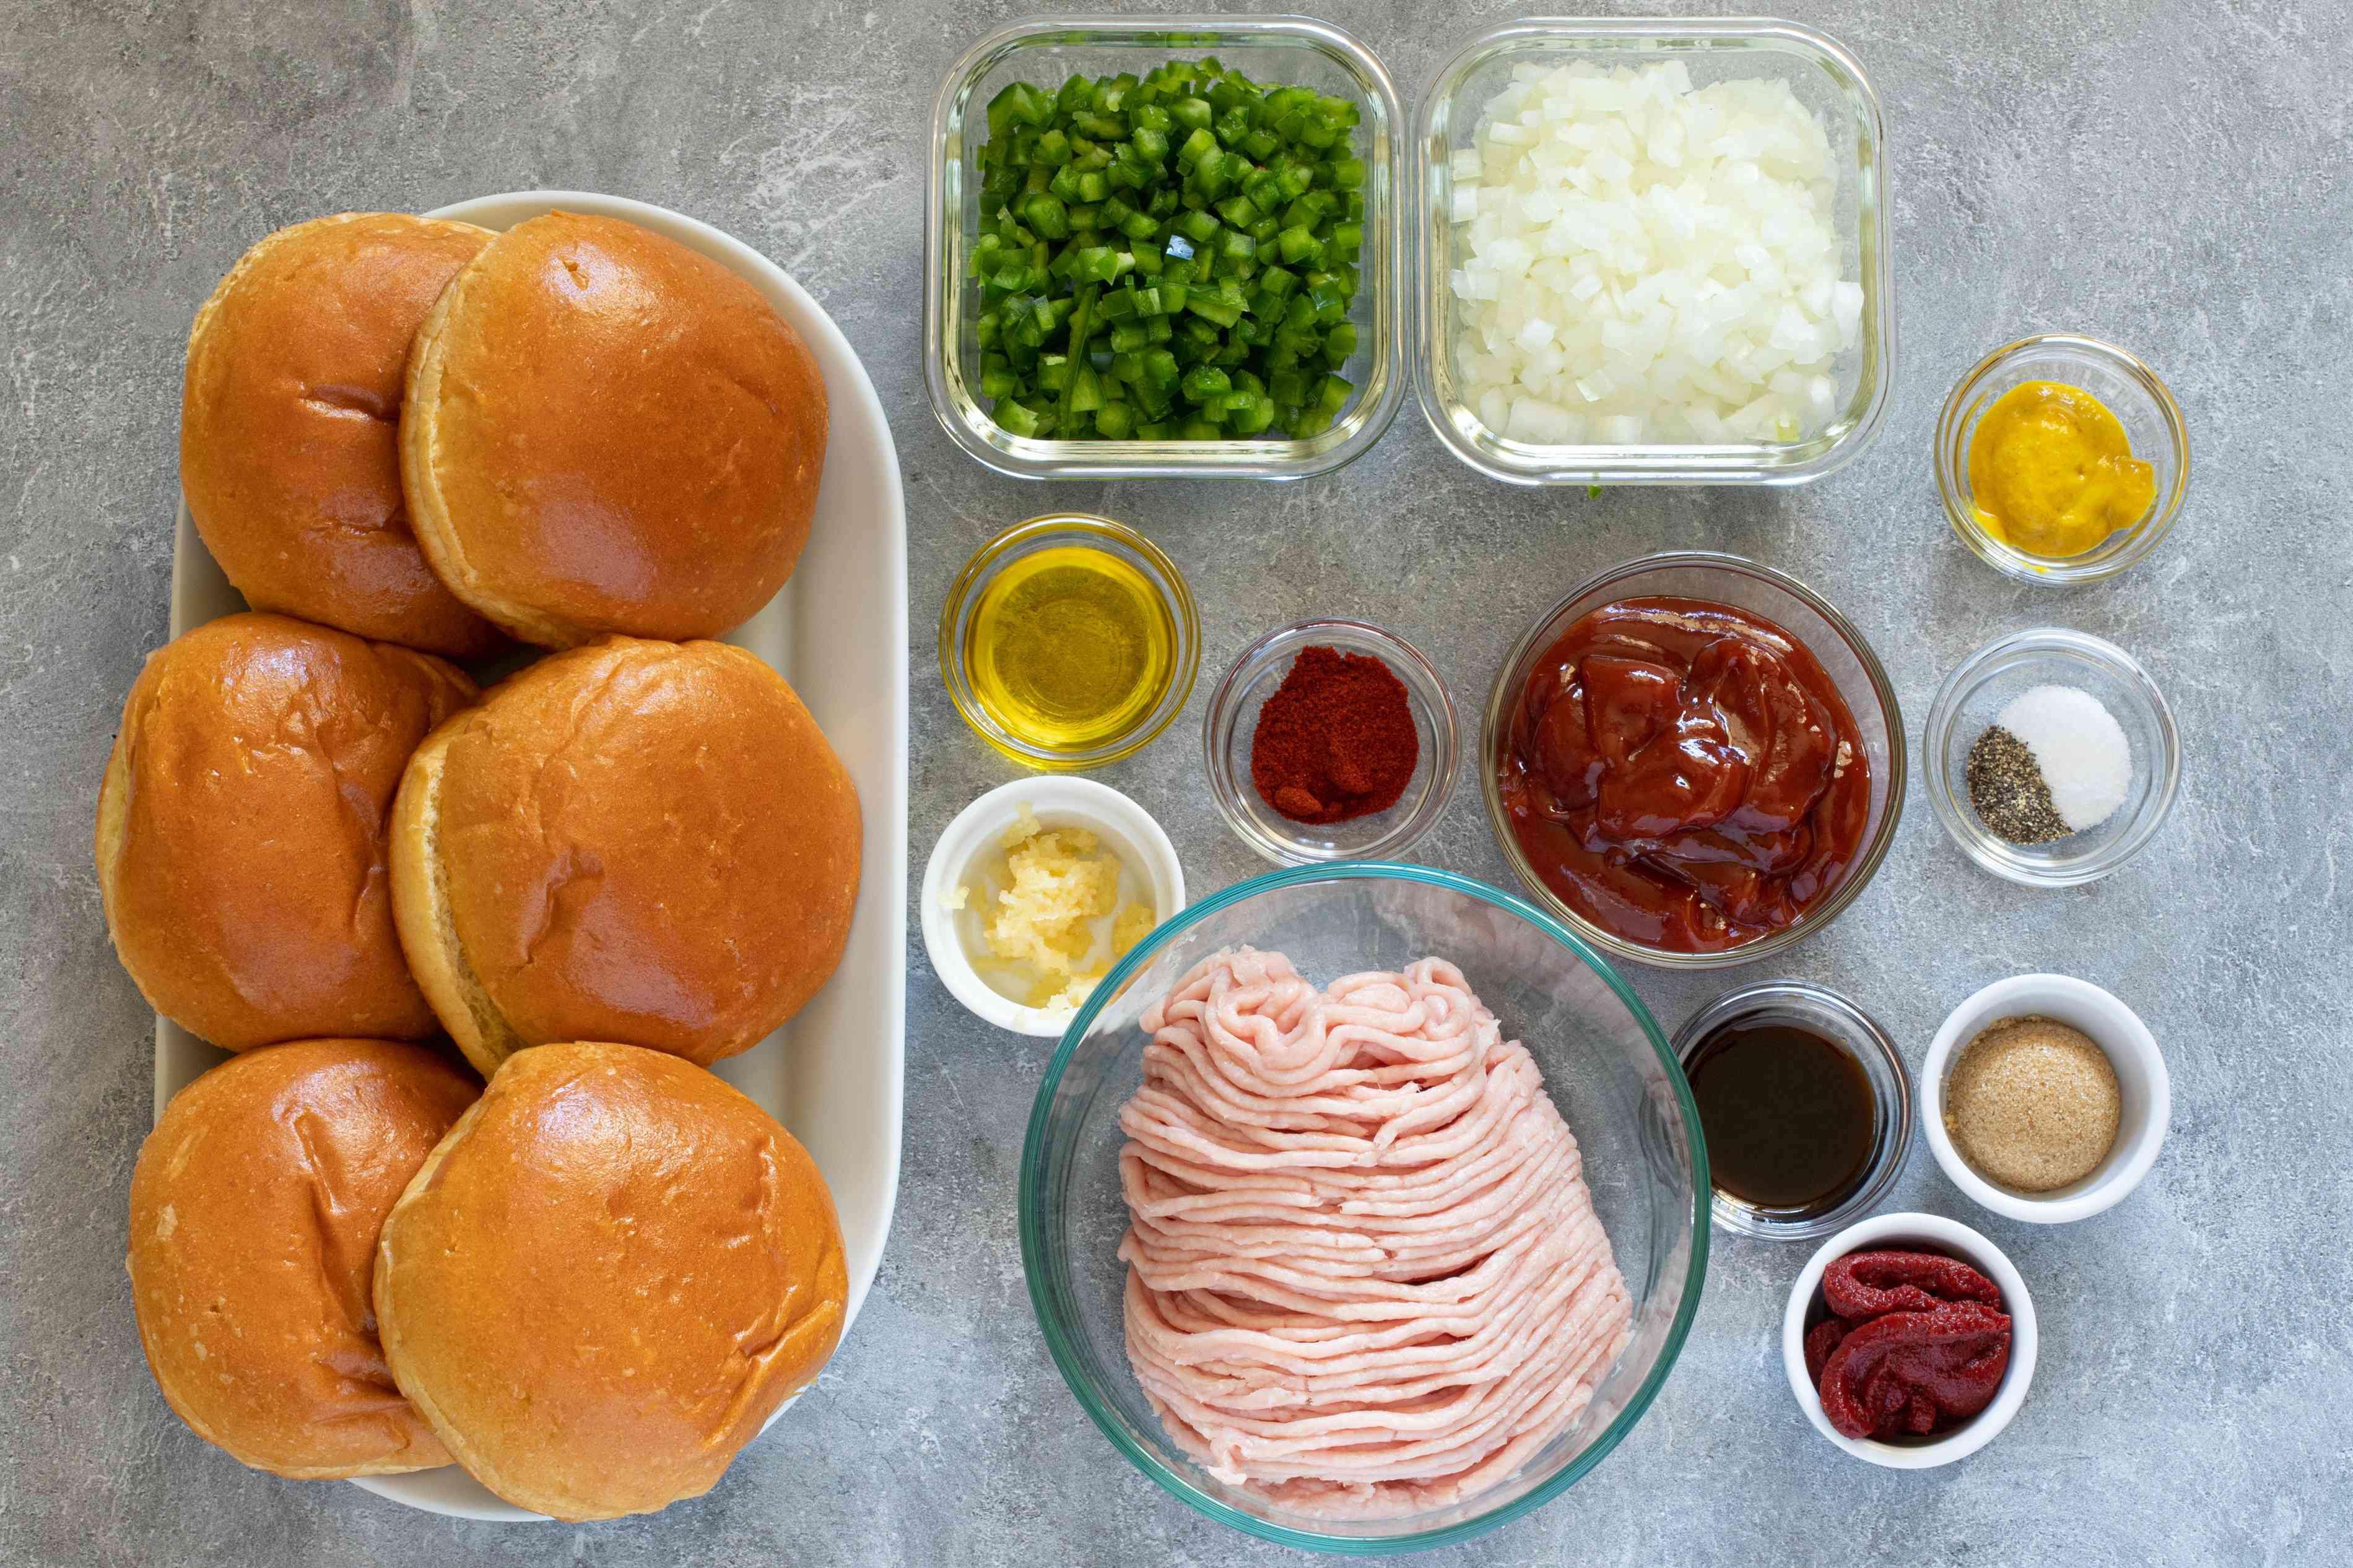 Ingredients for ground turkey sloppy joes